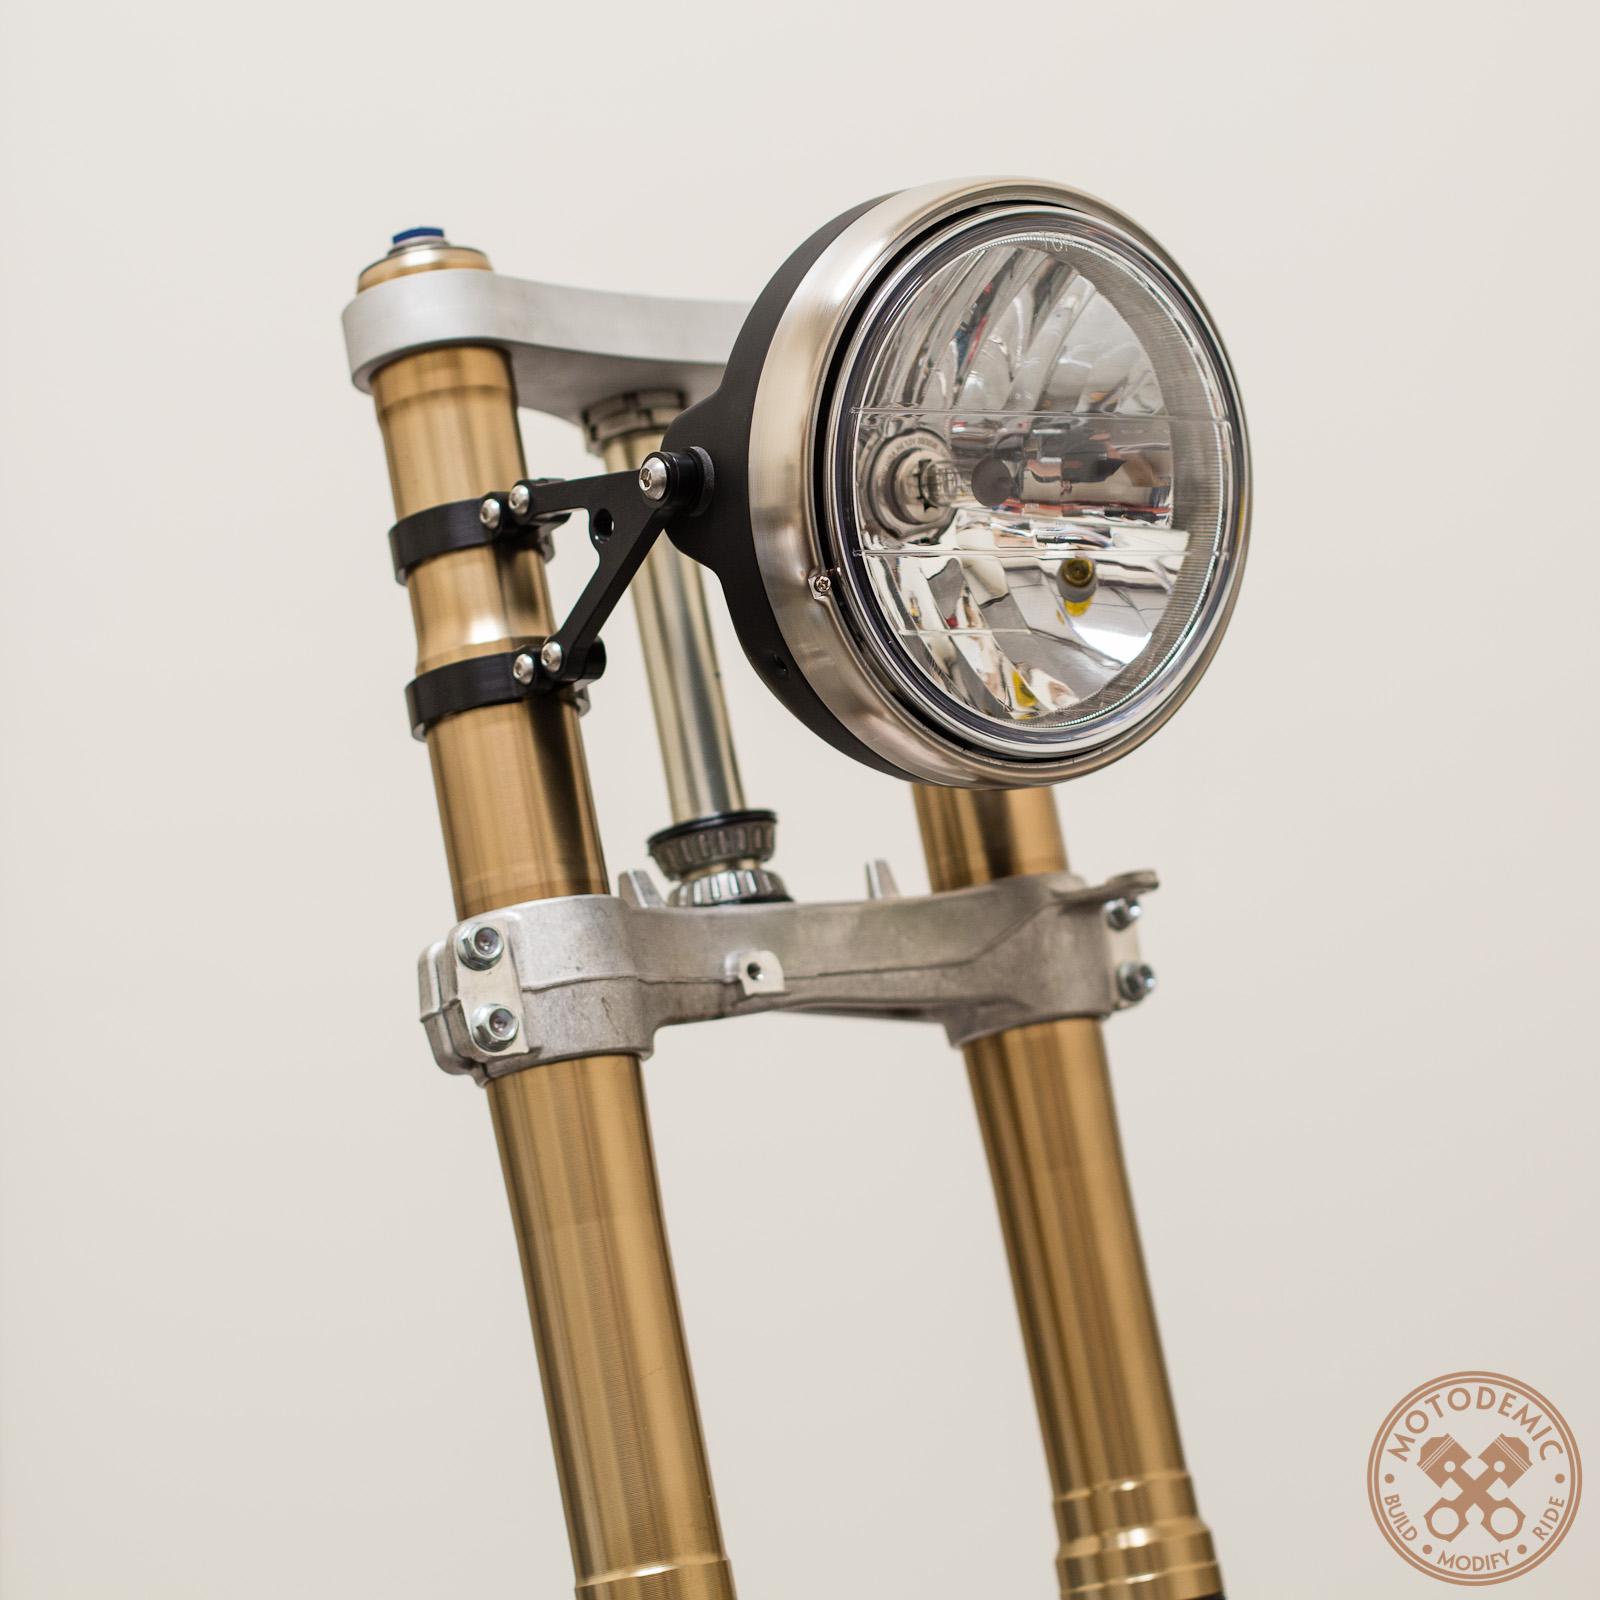 GSXR Custom Headlight Brackets • MOTODEMIC